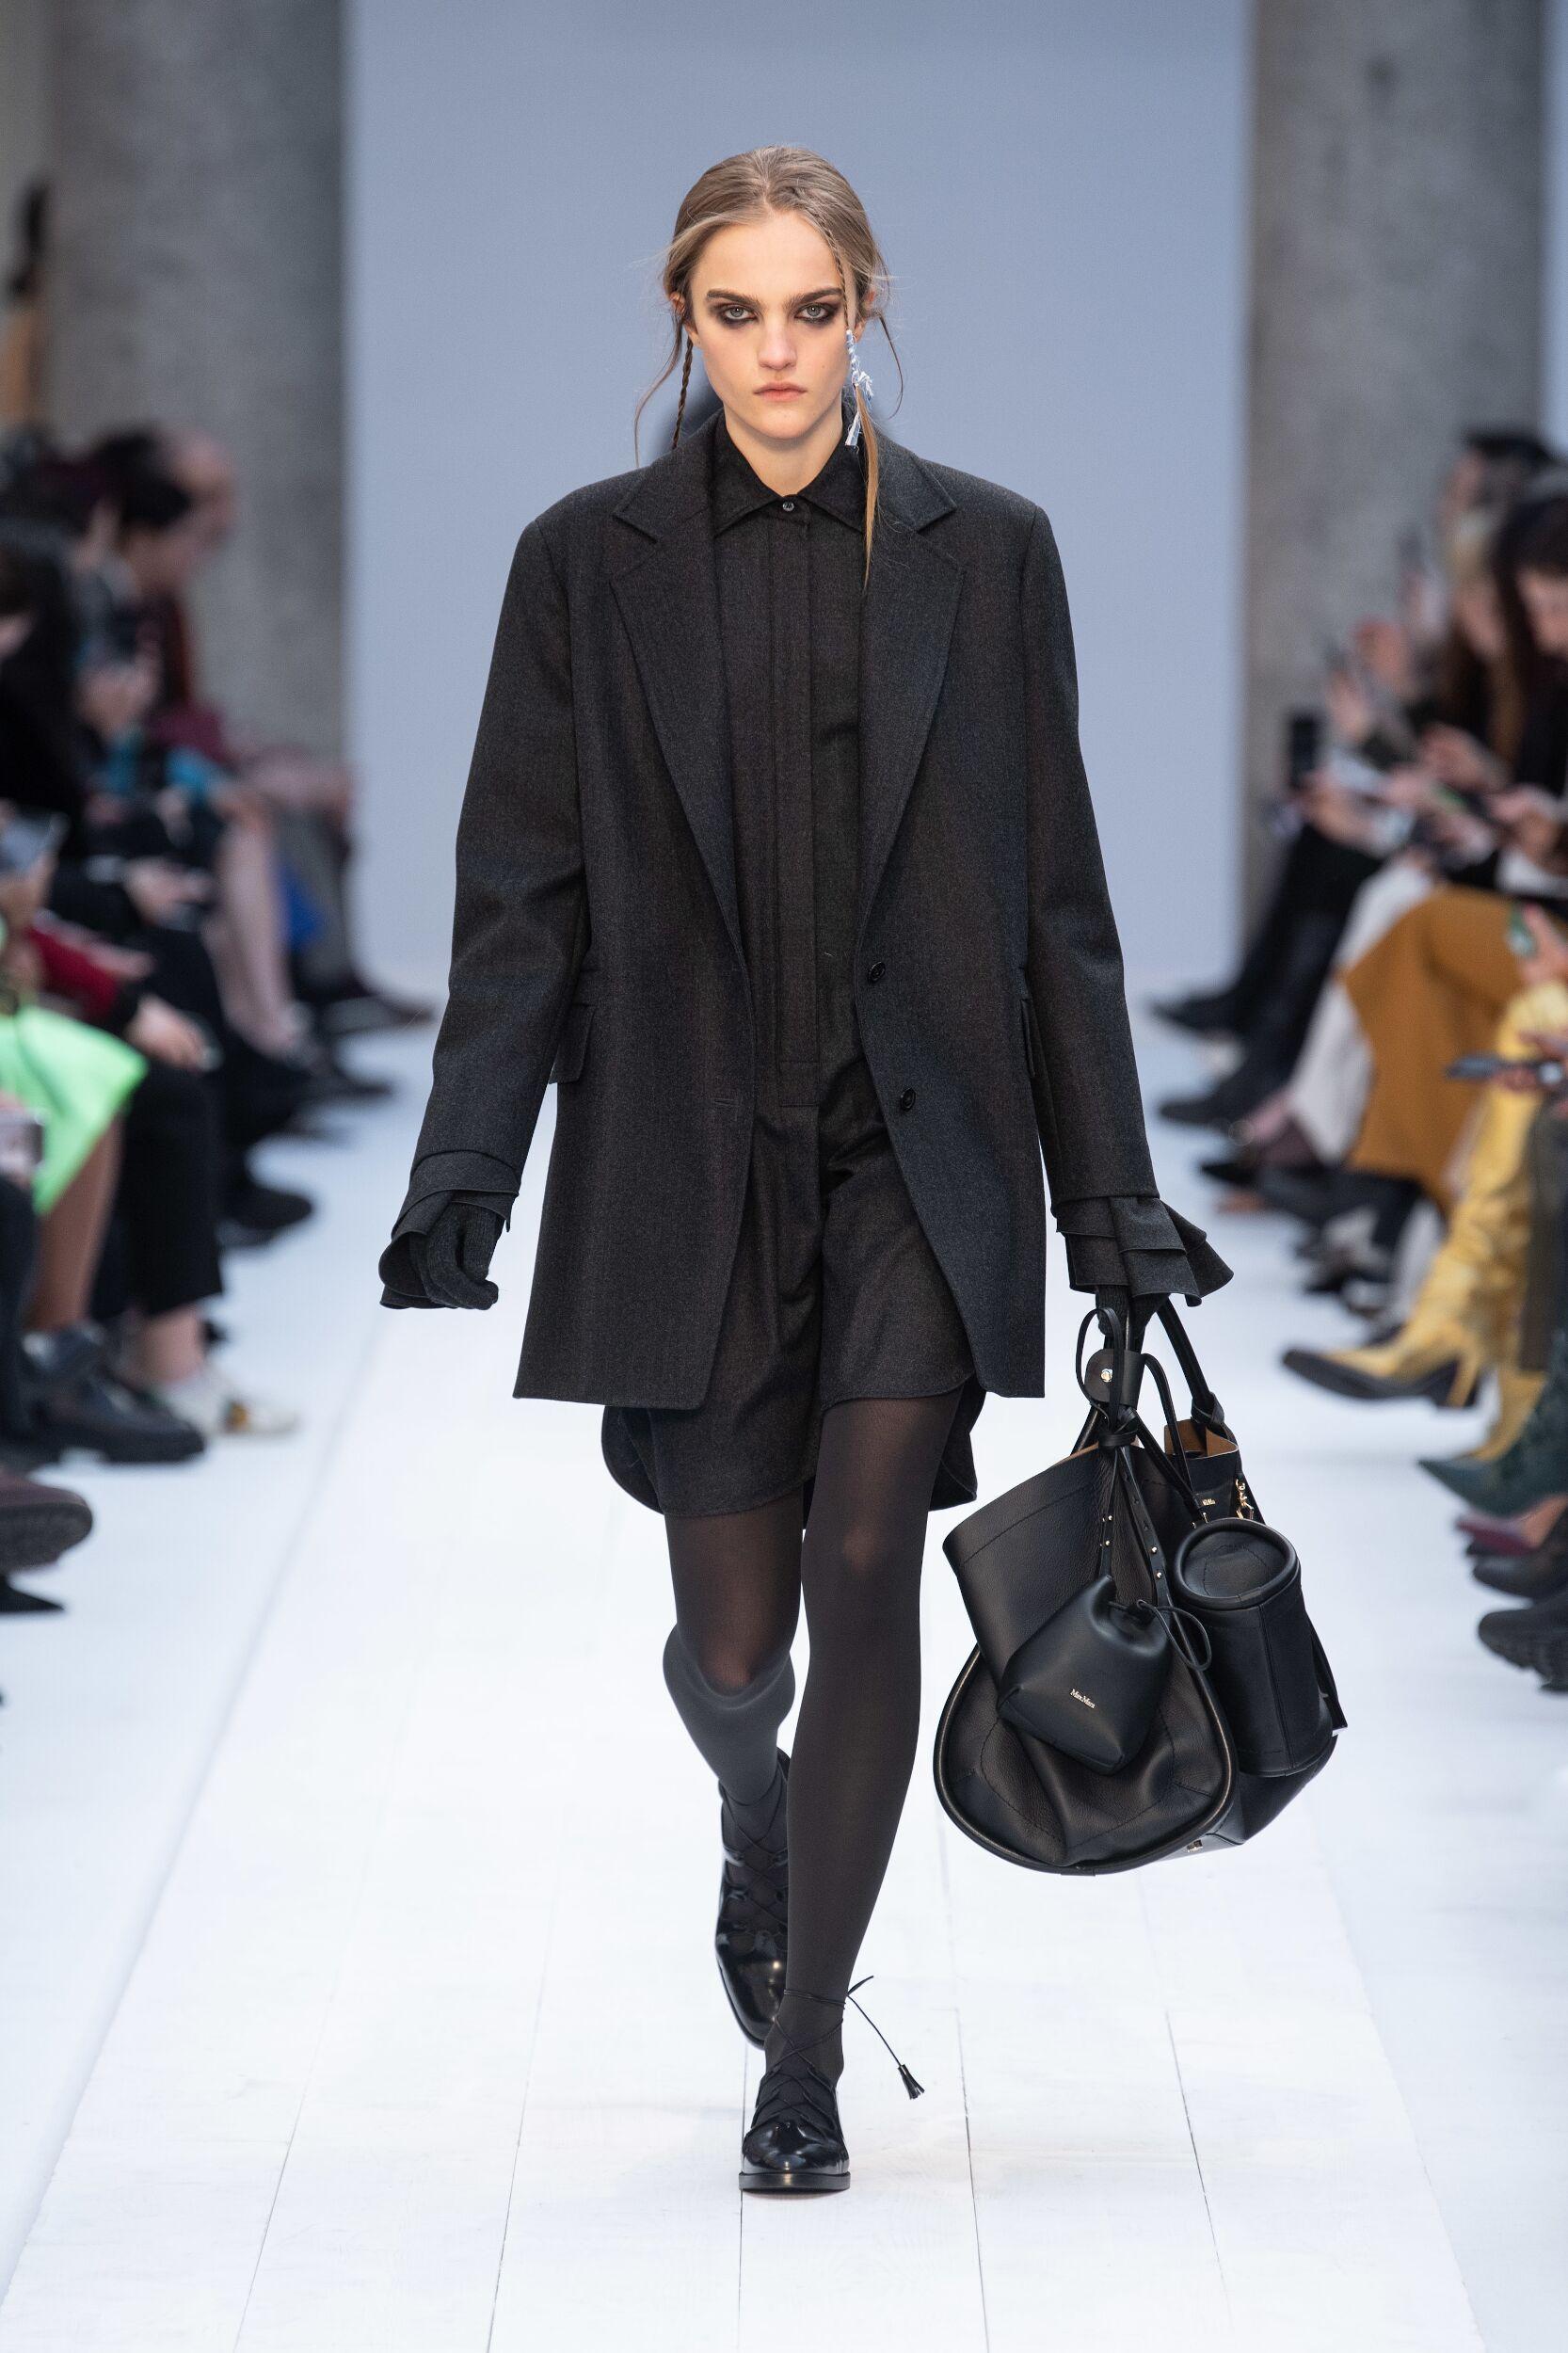 Max Mara Women's Collection 2020-21